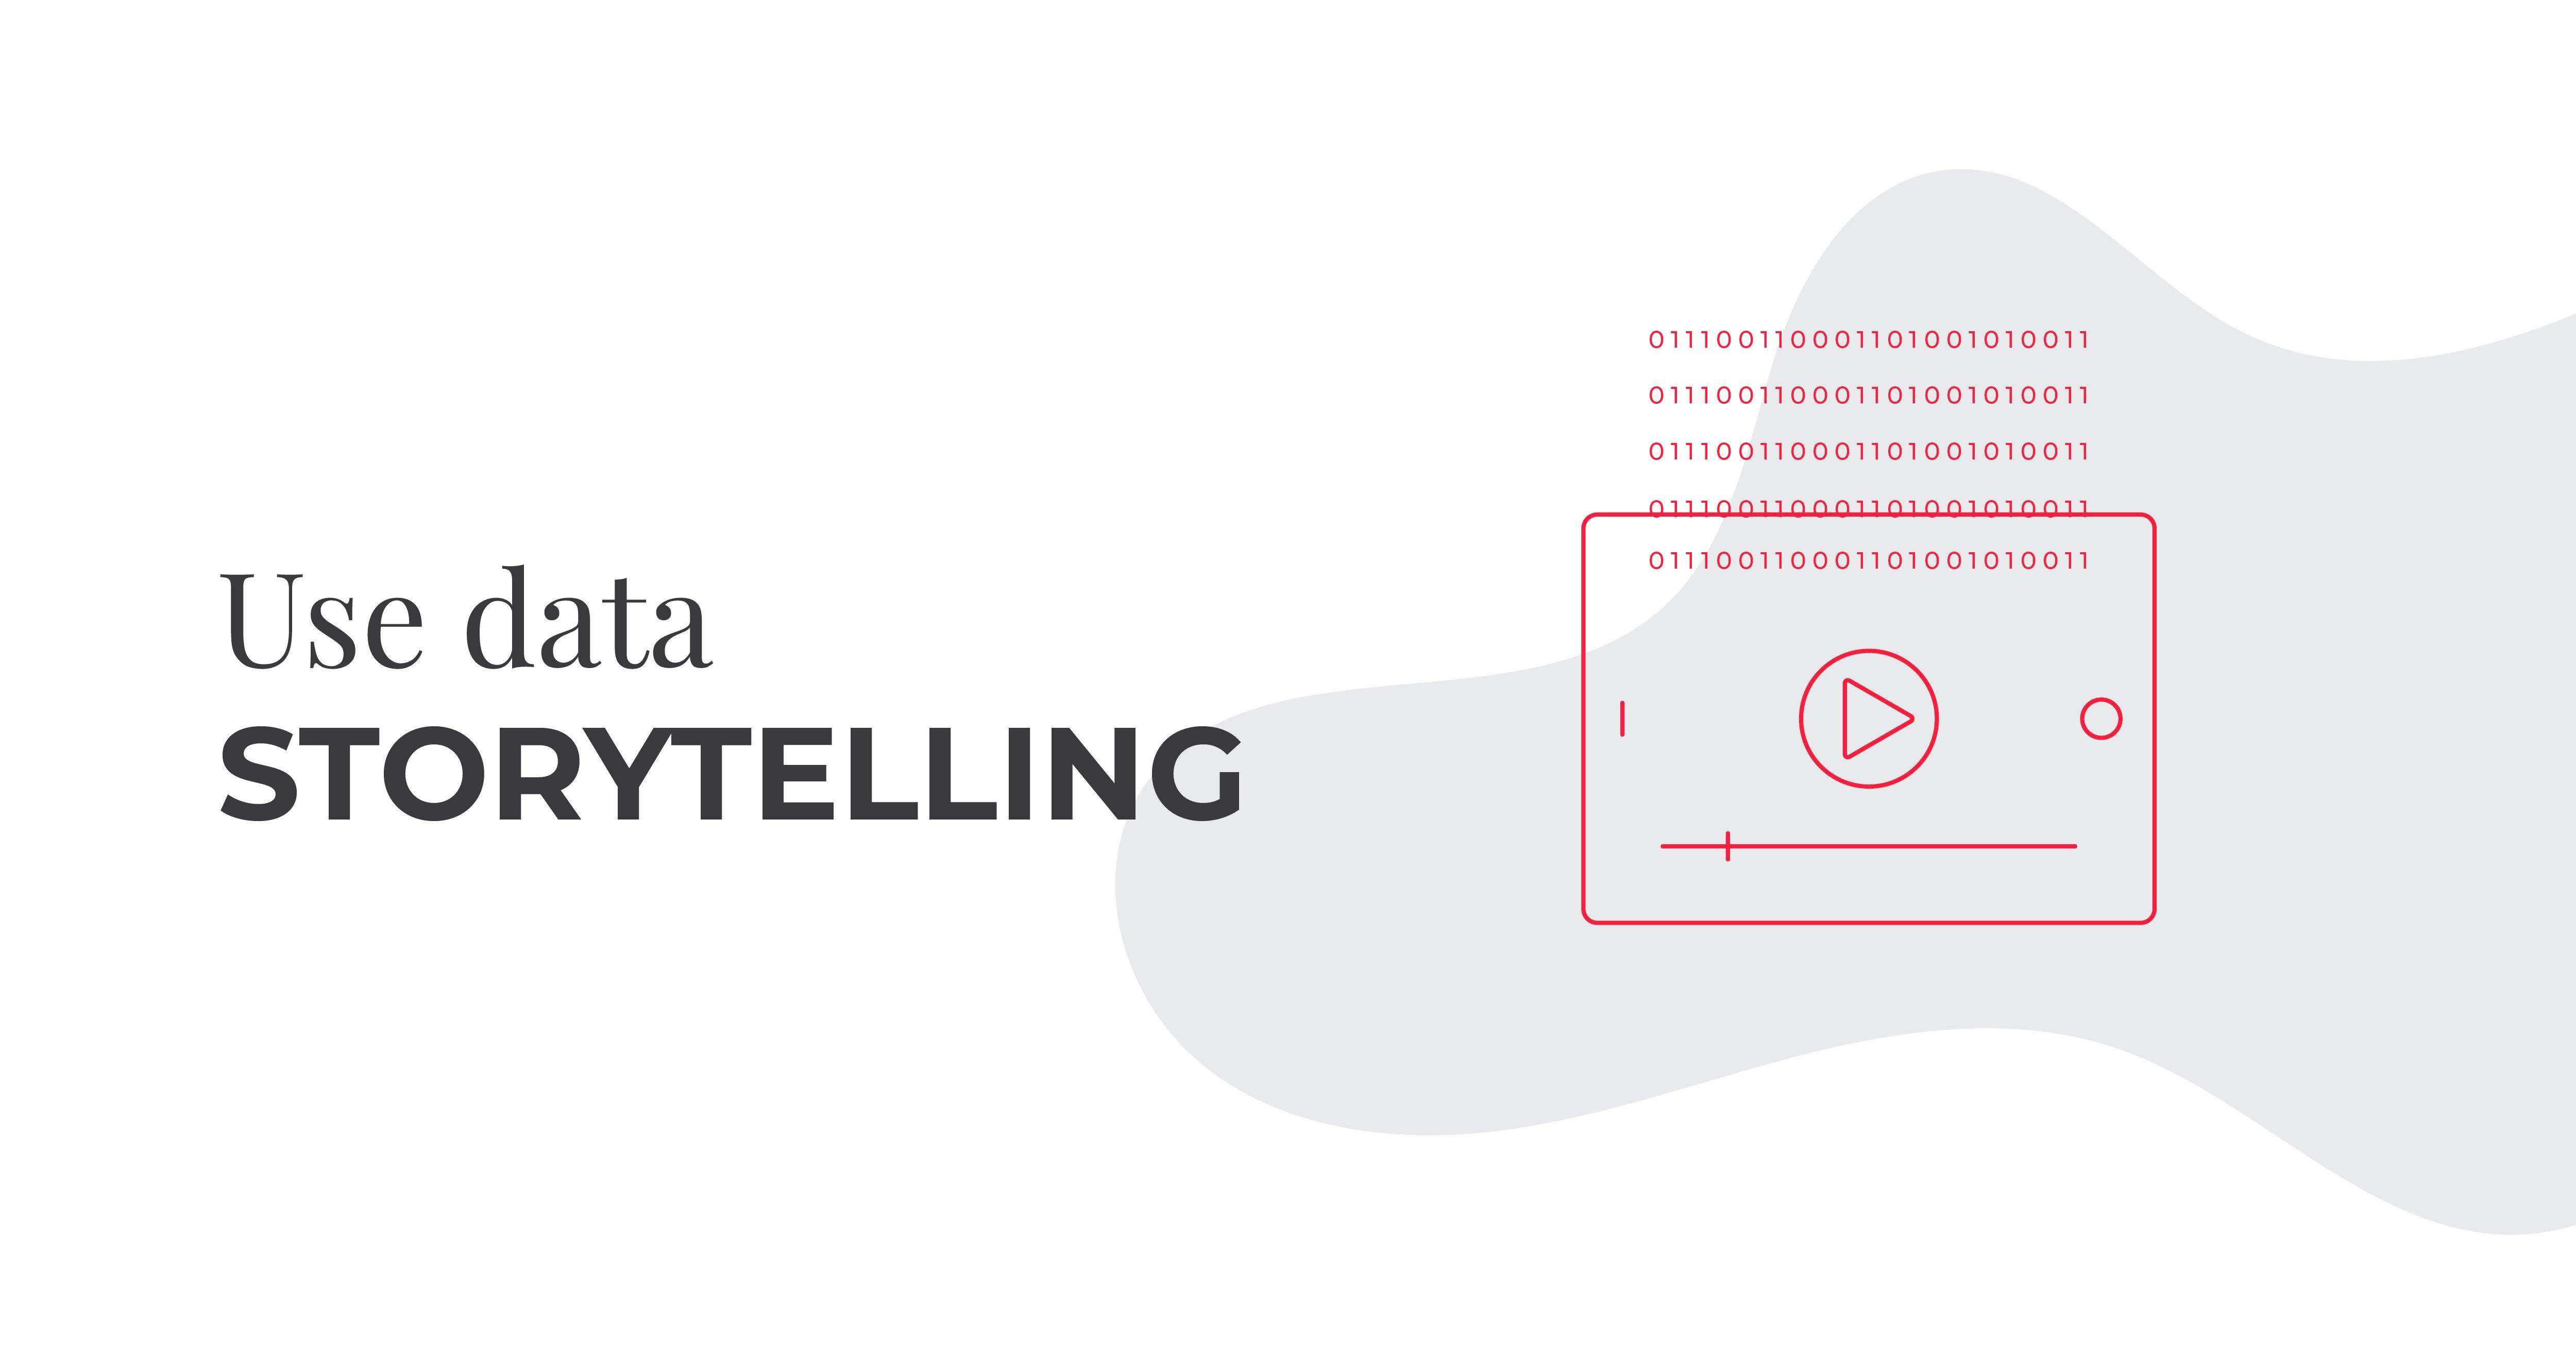 use data storytelling